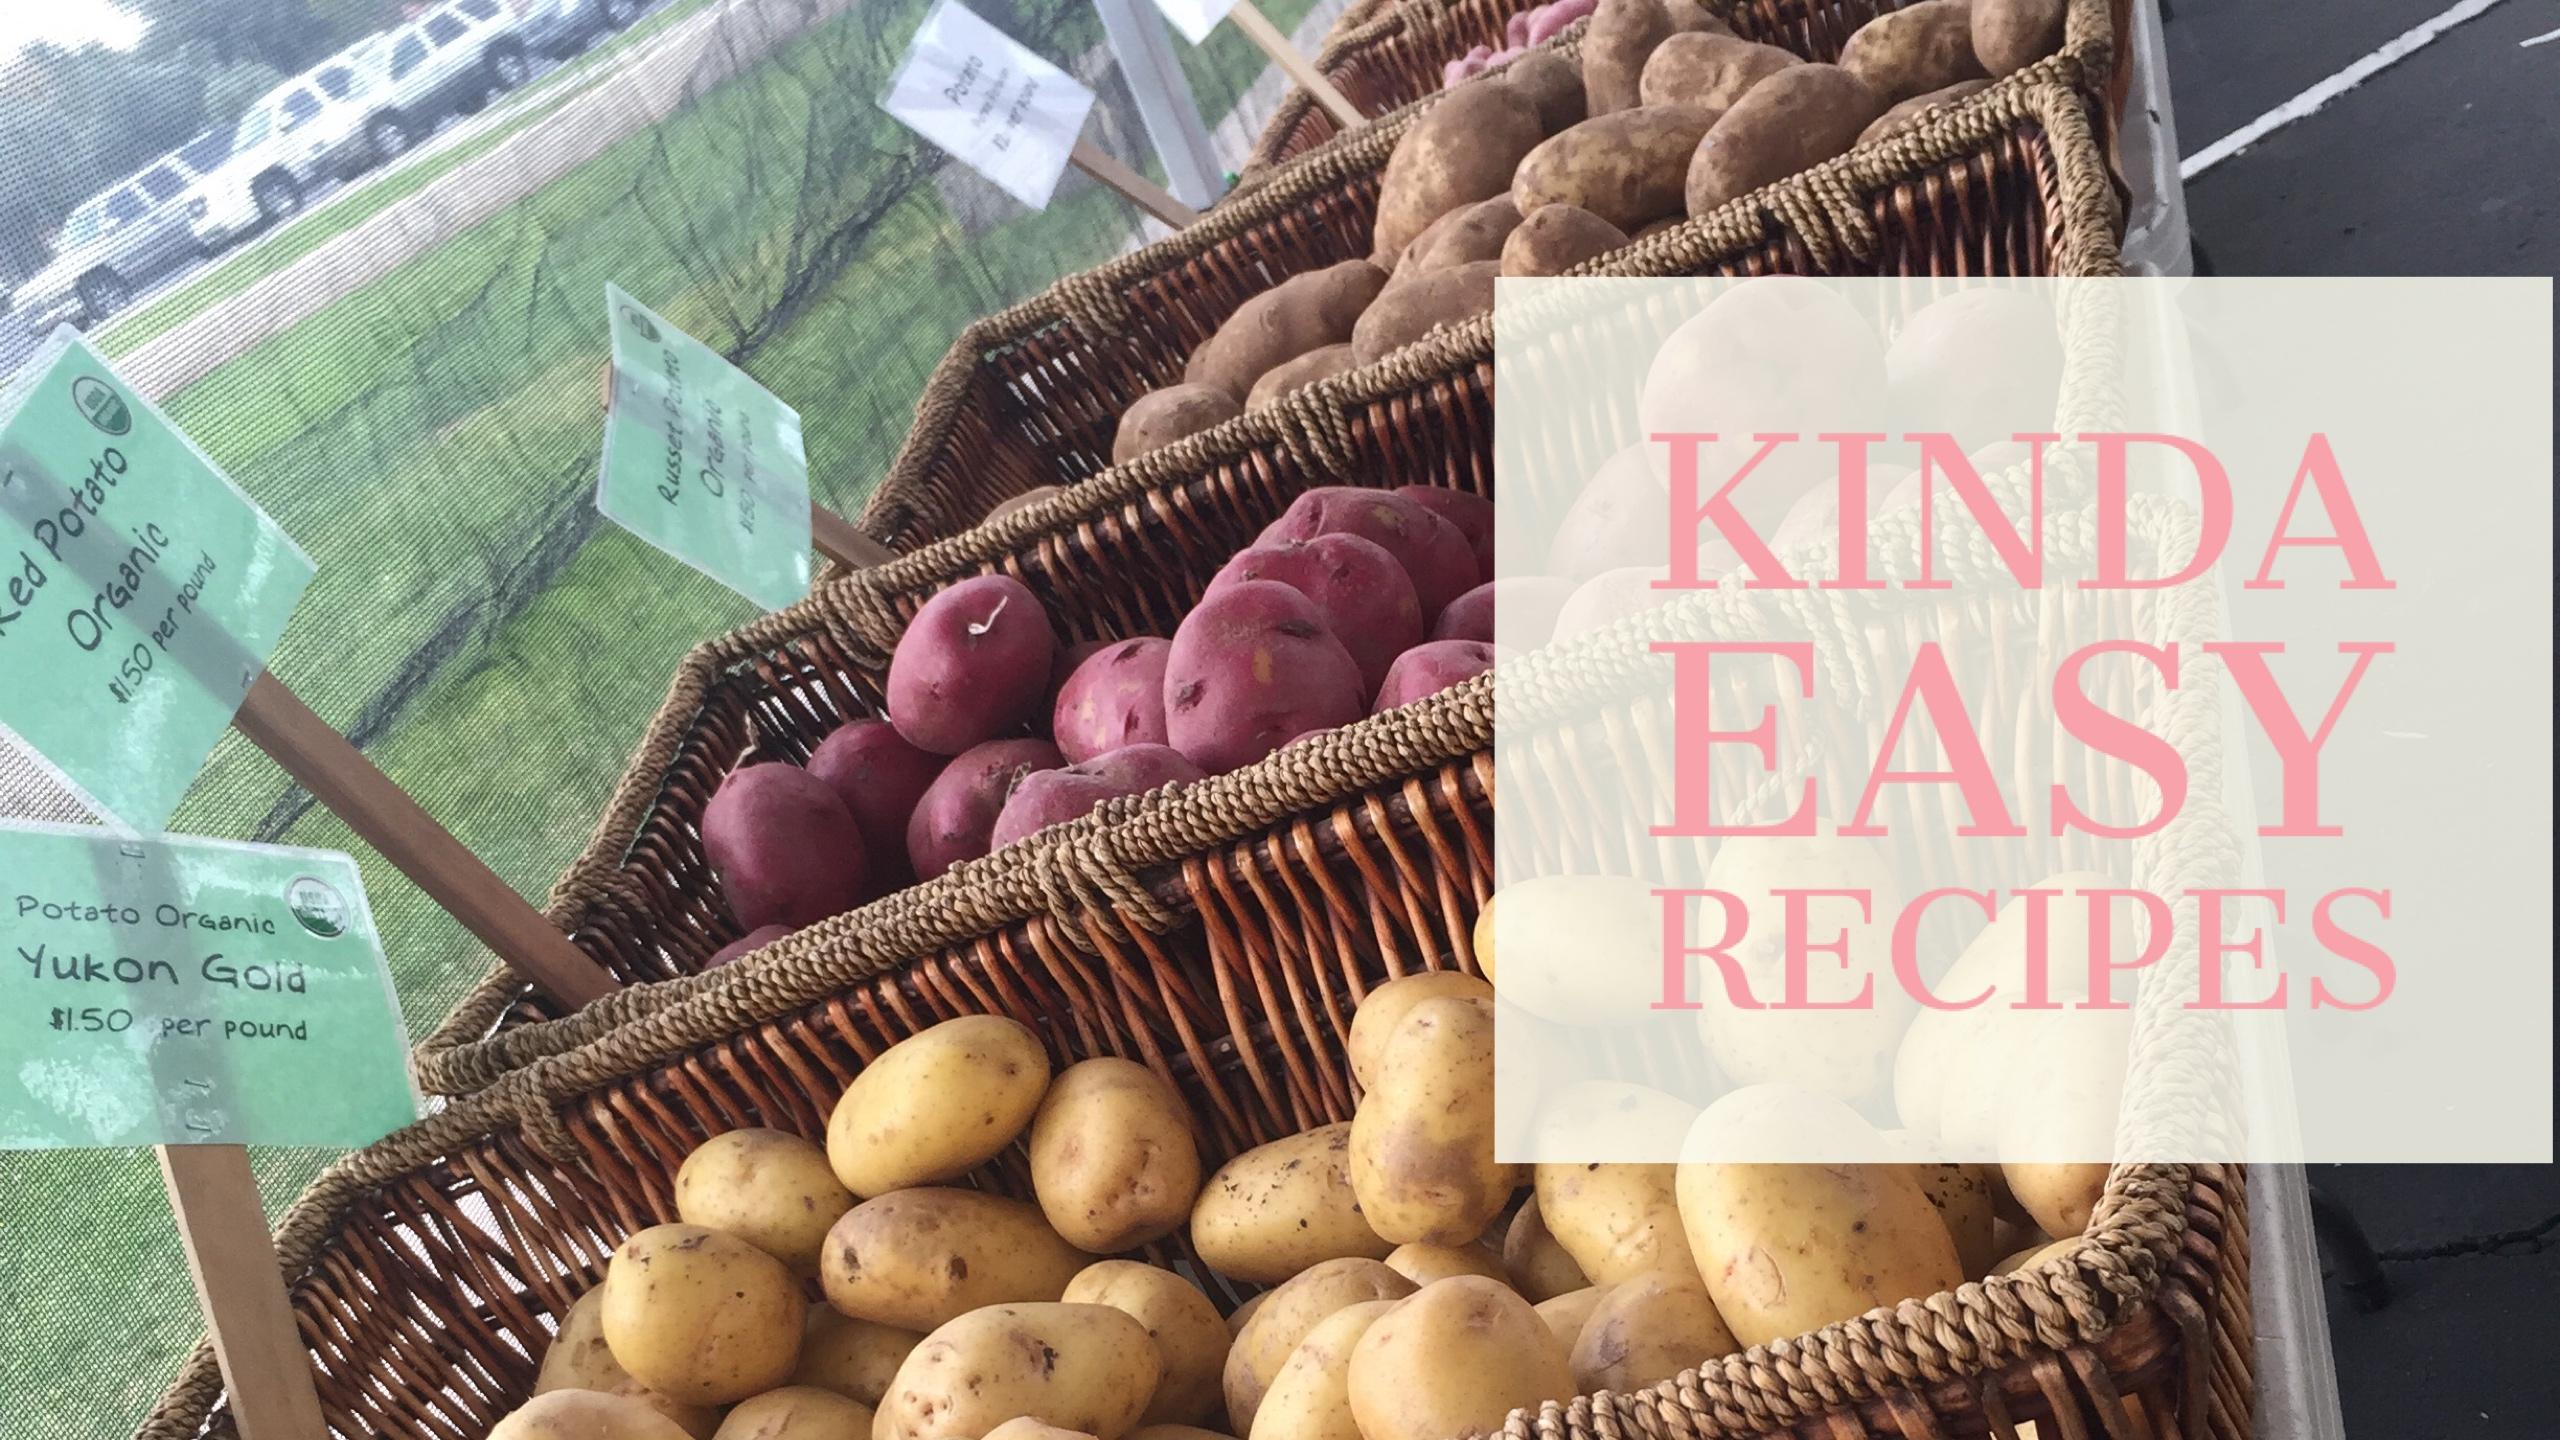 organic-non-gmo-potatoes-kinda-easy-recipes